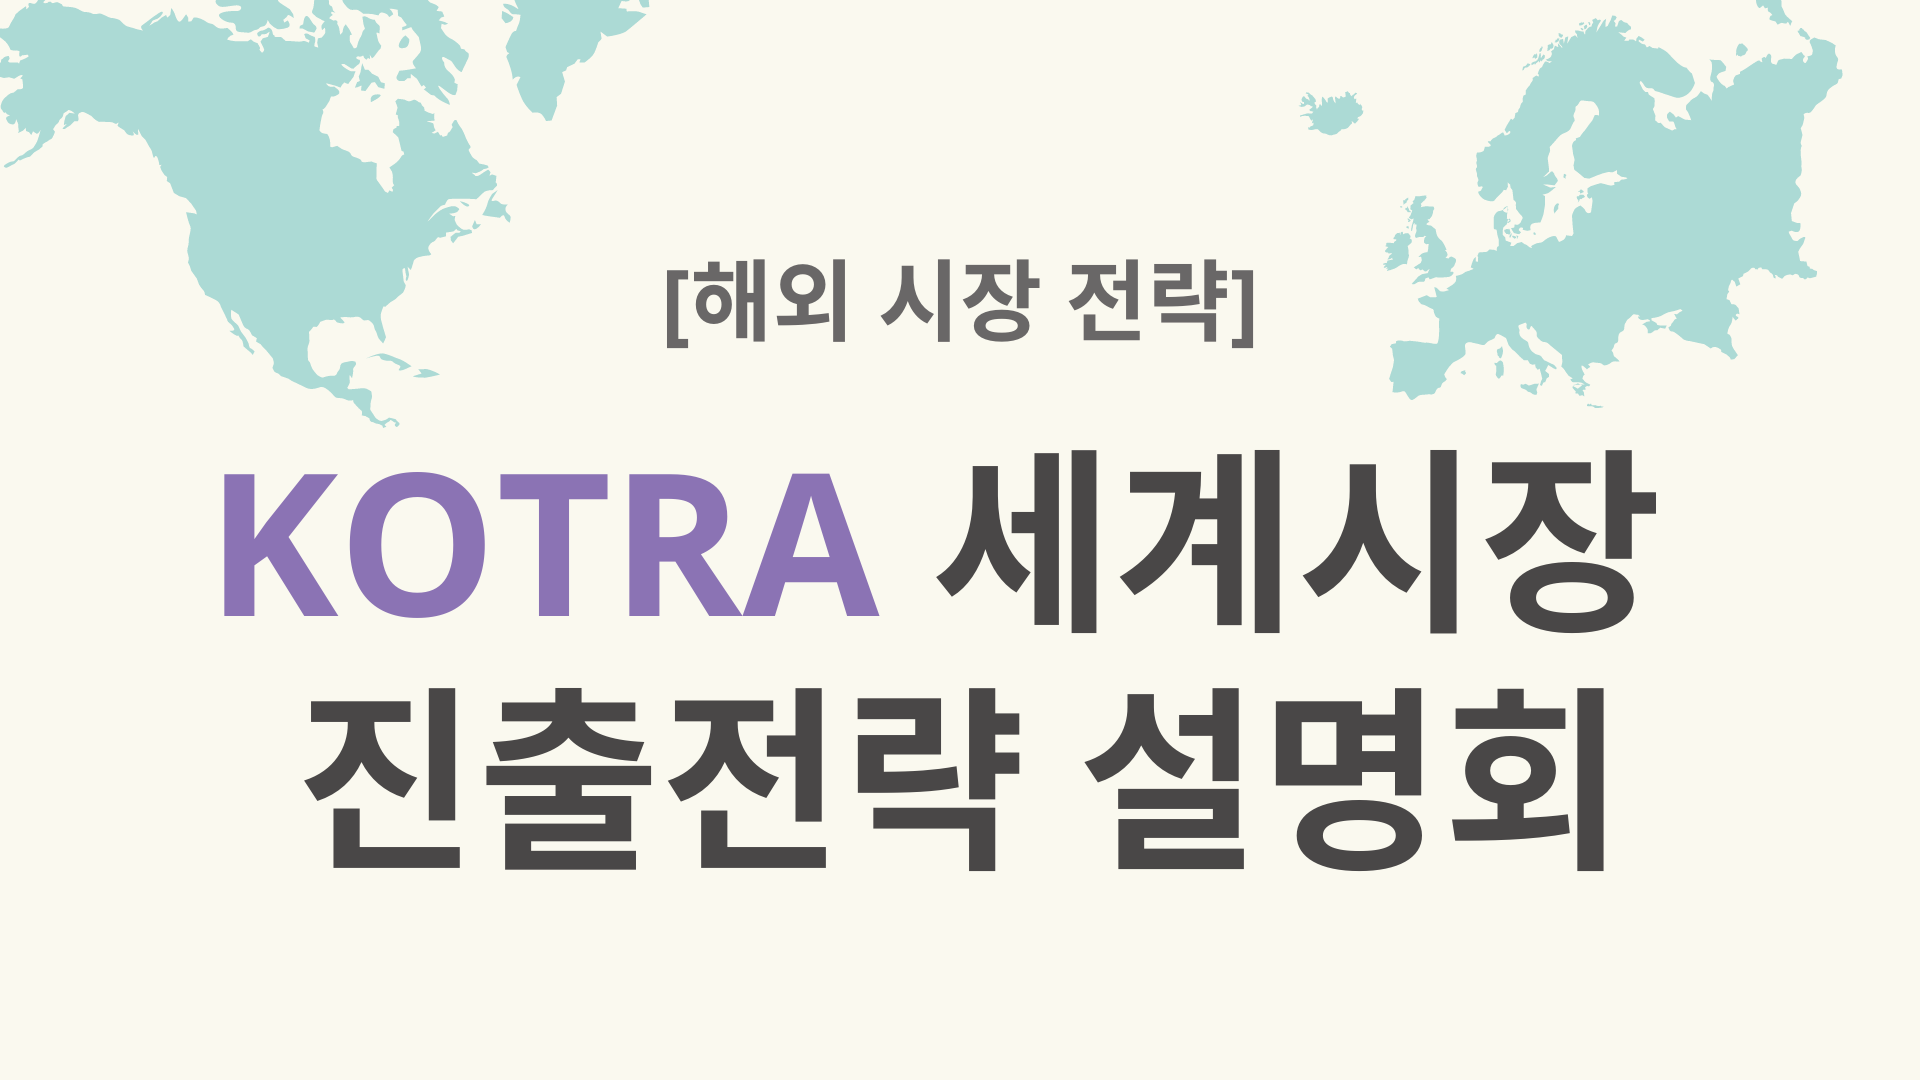 KOTRA 세계시장 진출전략 설명회, 지역별 수출 전략